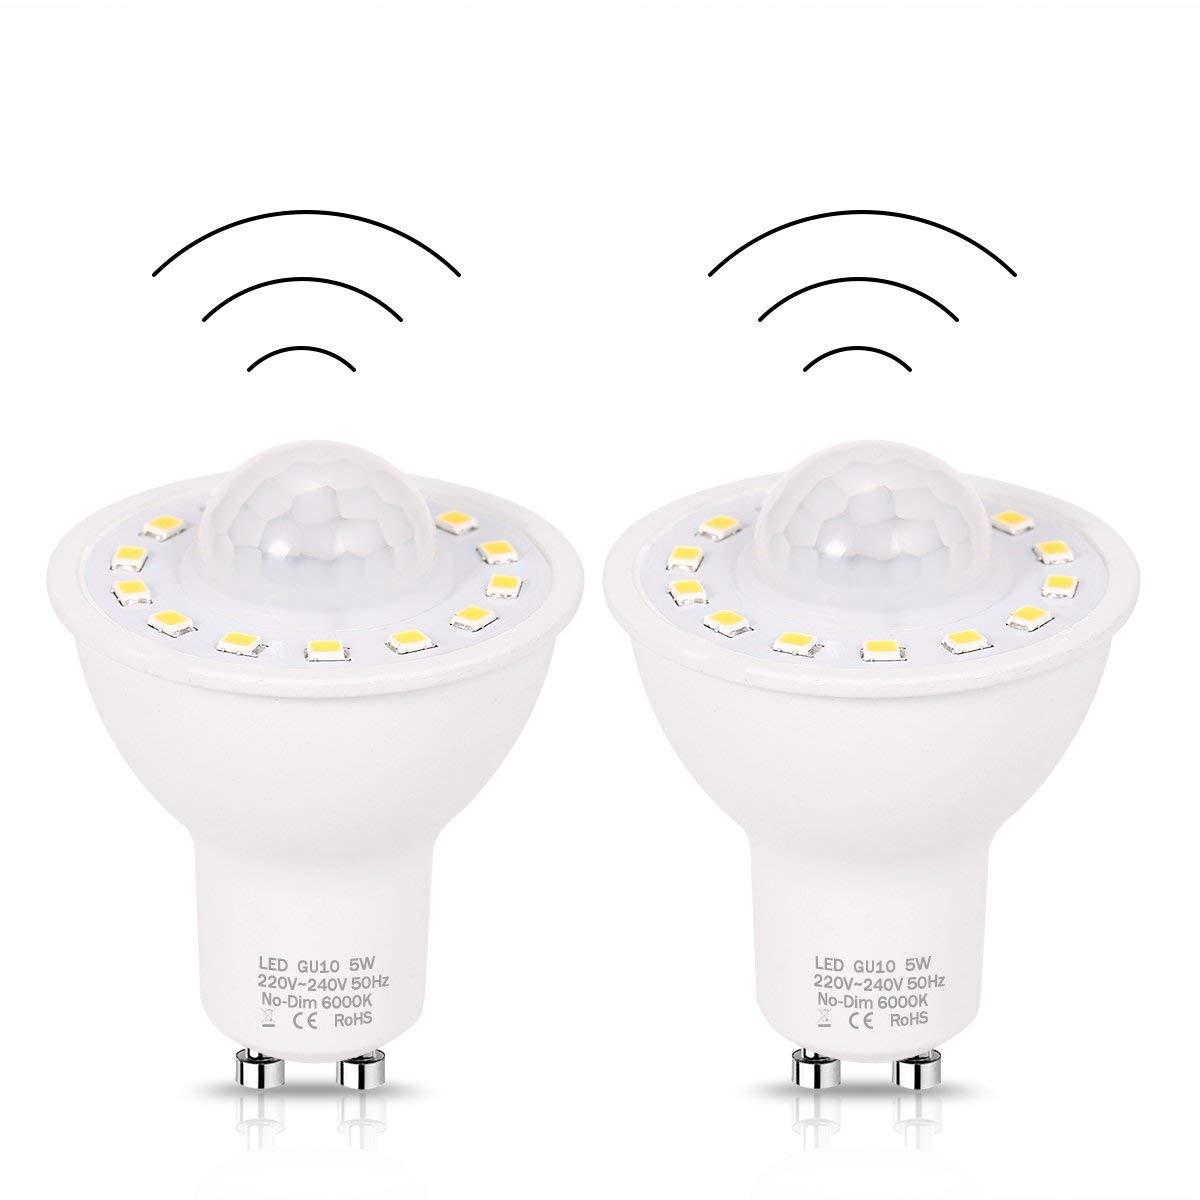 Equivalent 50w 500lm, 2 x PIR Motion Sensor Light Bulbs TECHGOMADE 5W LED GU10